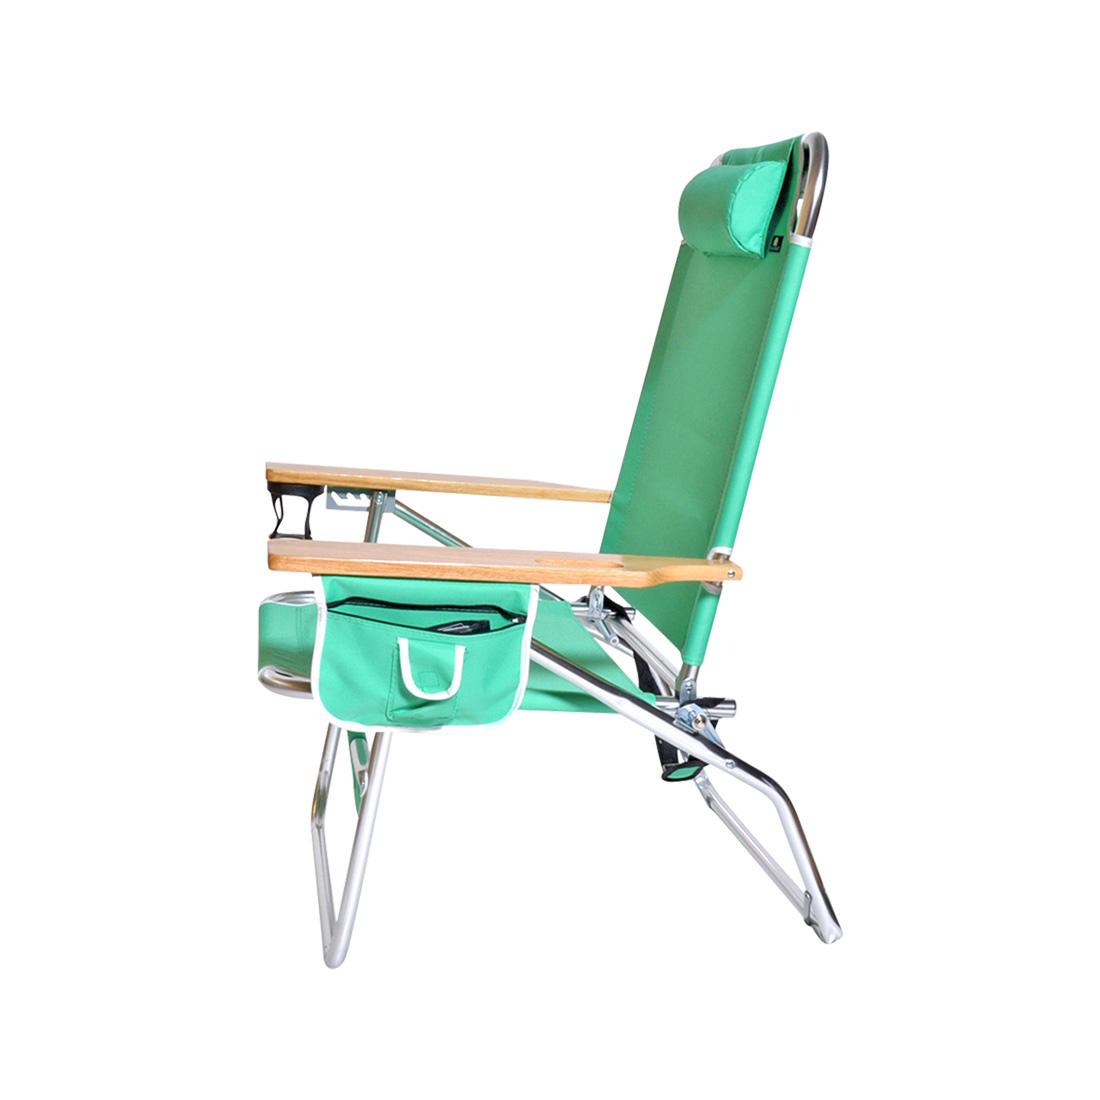 big and tall outdoor chairs 500lbs bedroom sitting room jumbo heavy duty 500 lbs xl aluminum beach chair for